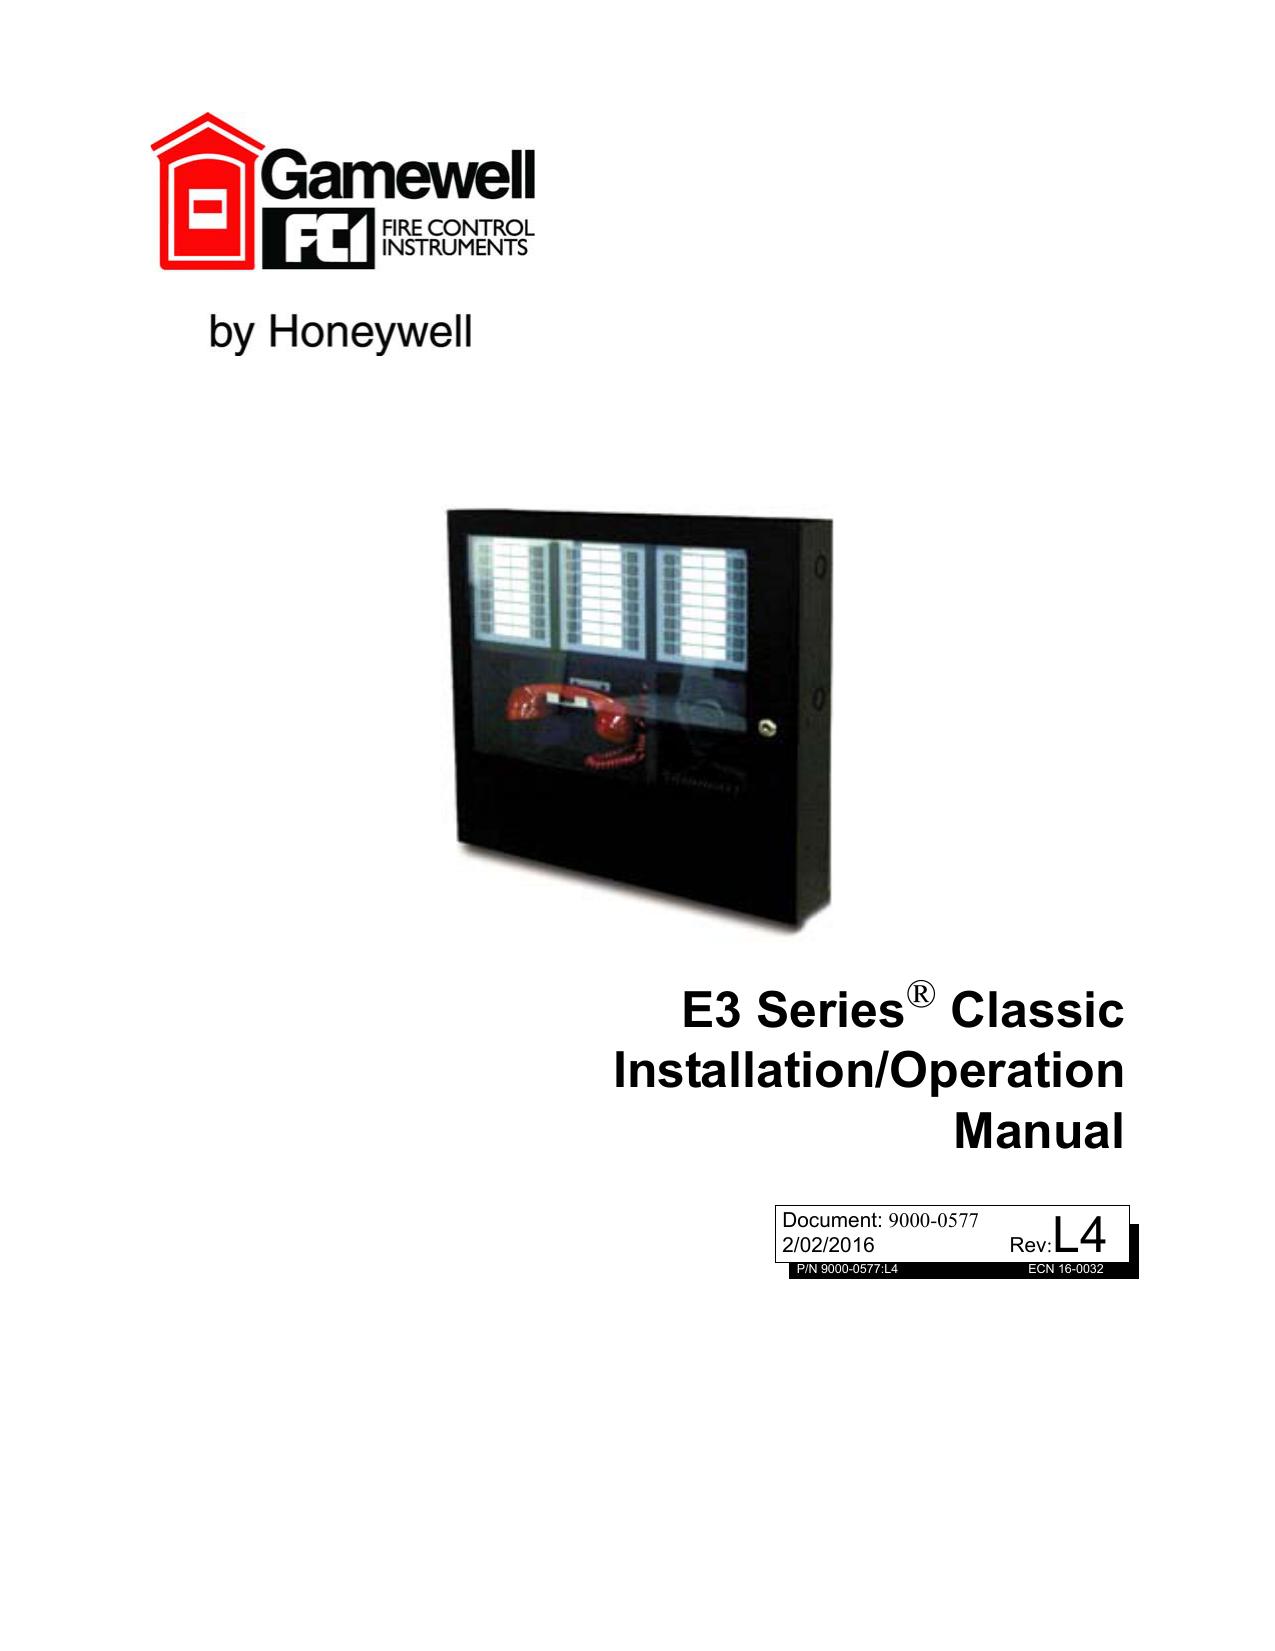 l4 e3 series classic installation/operation manual